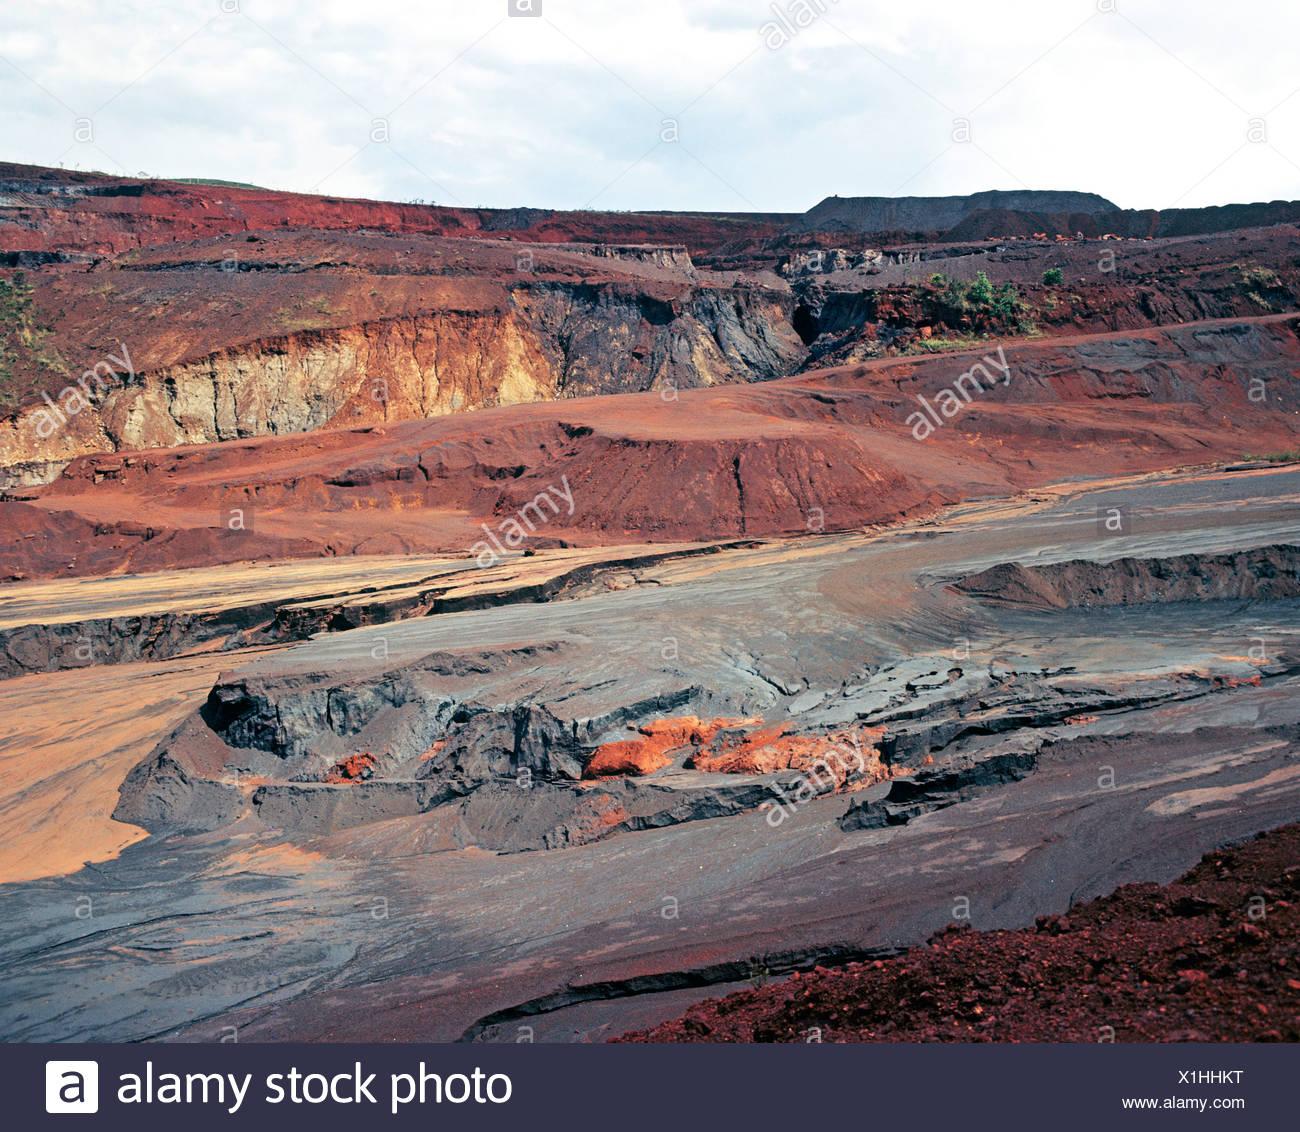 Ore mining in Mineracao between Rio de Janeiro and Belo Horizonte, Brazil, South America Stock Photo